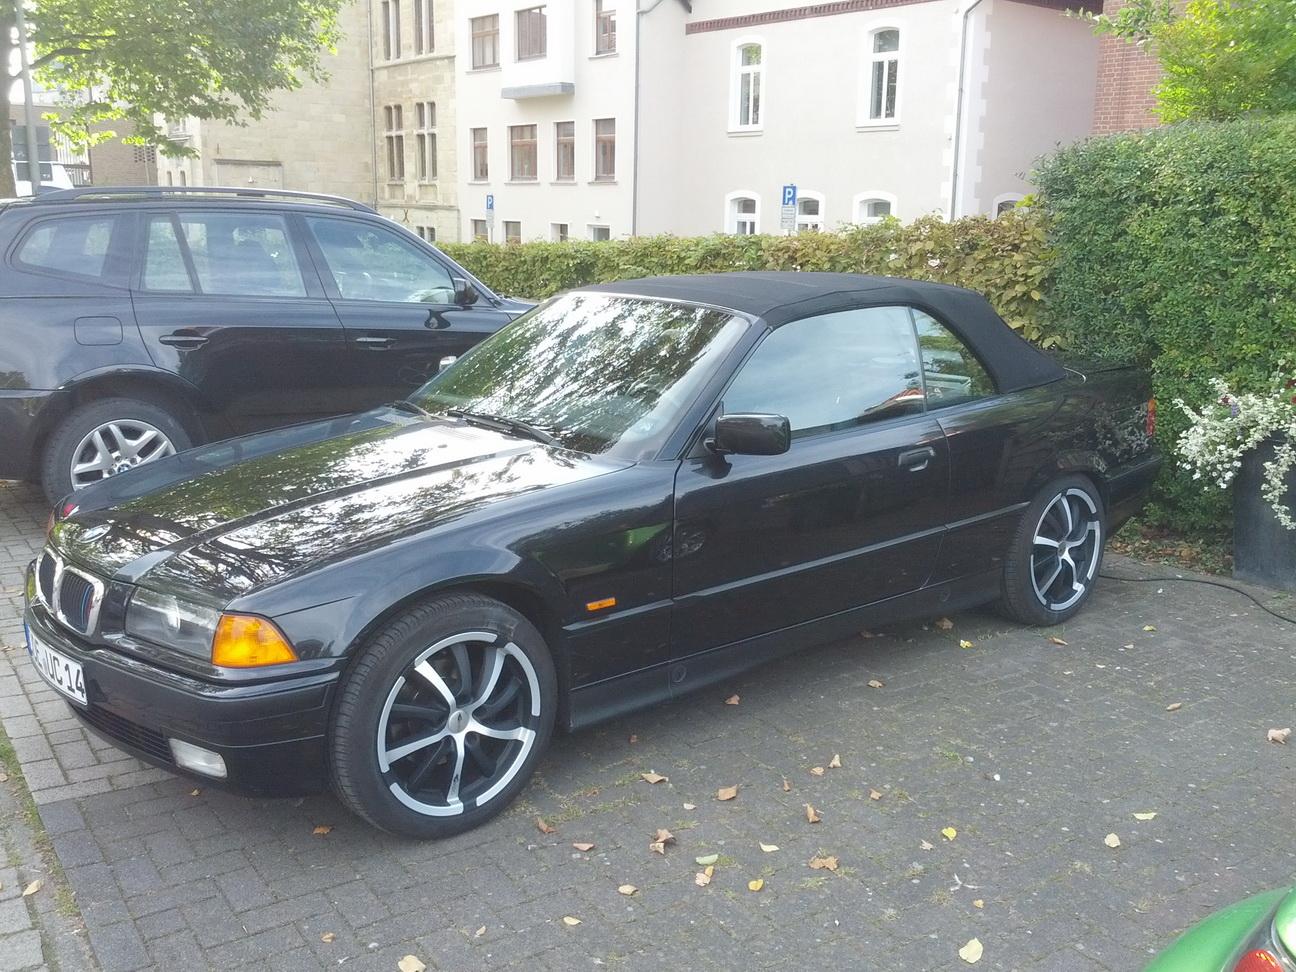 cabrio2.jpg